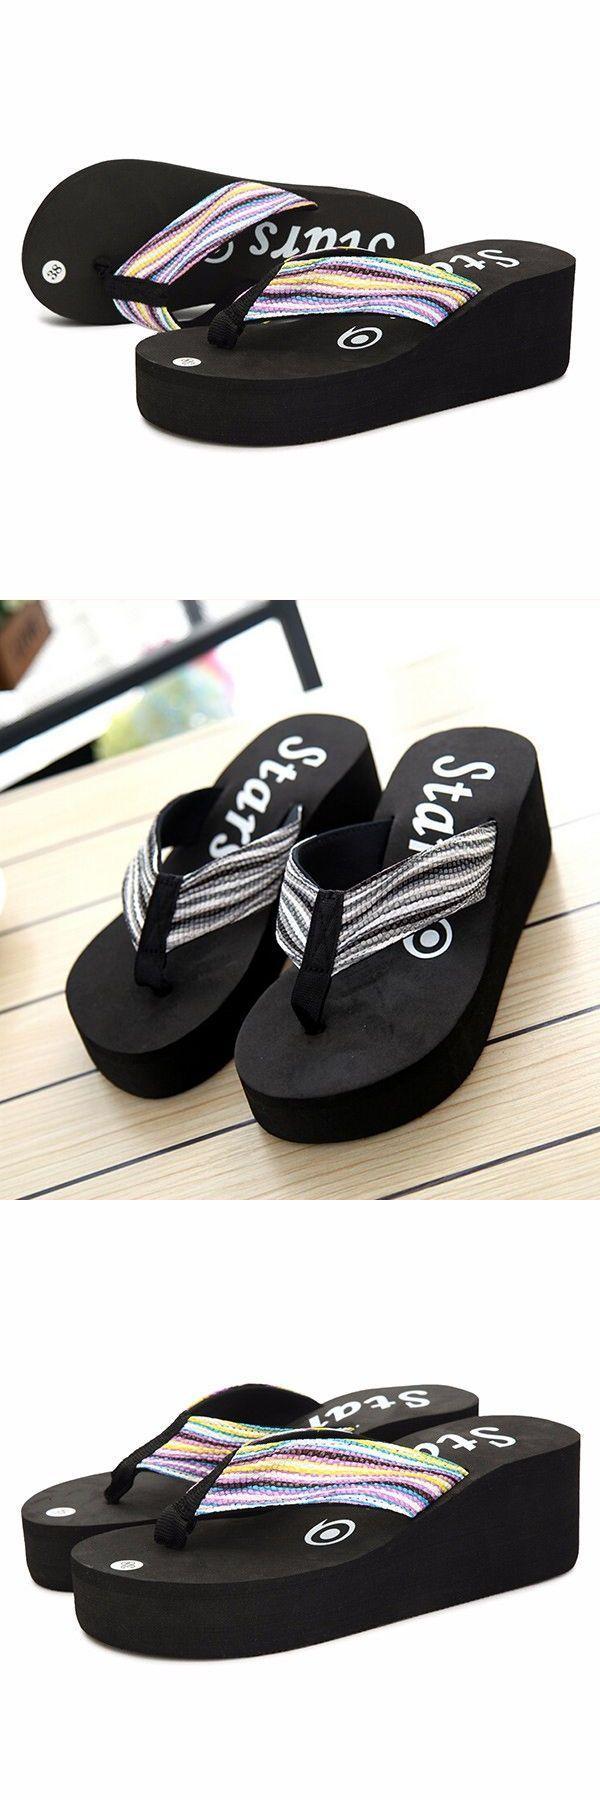 Slippers Movie Women Platform Flip Flops Fashion Casual Sandals Beautiful Rainbow Shoes Mamp